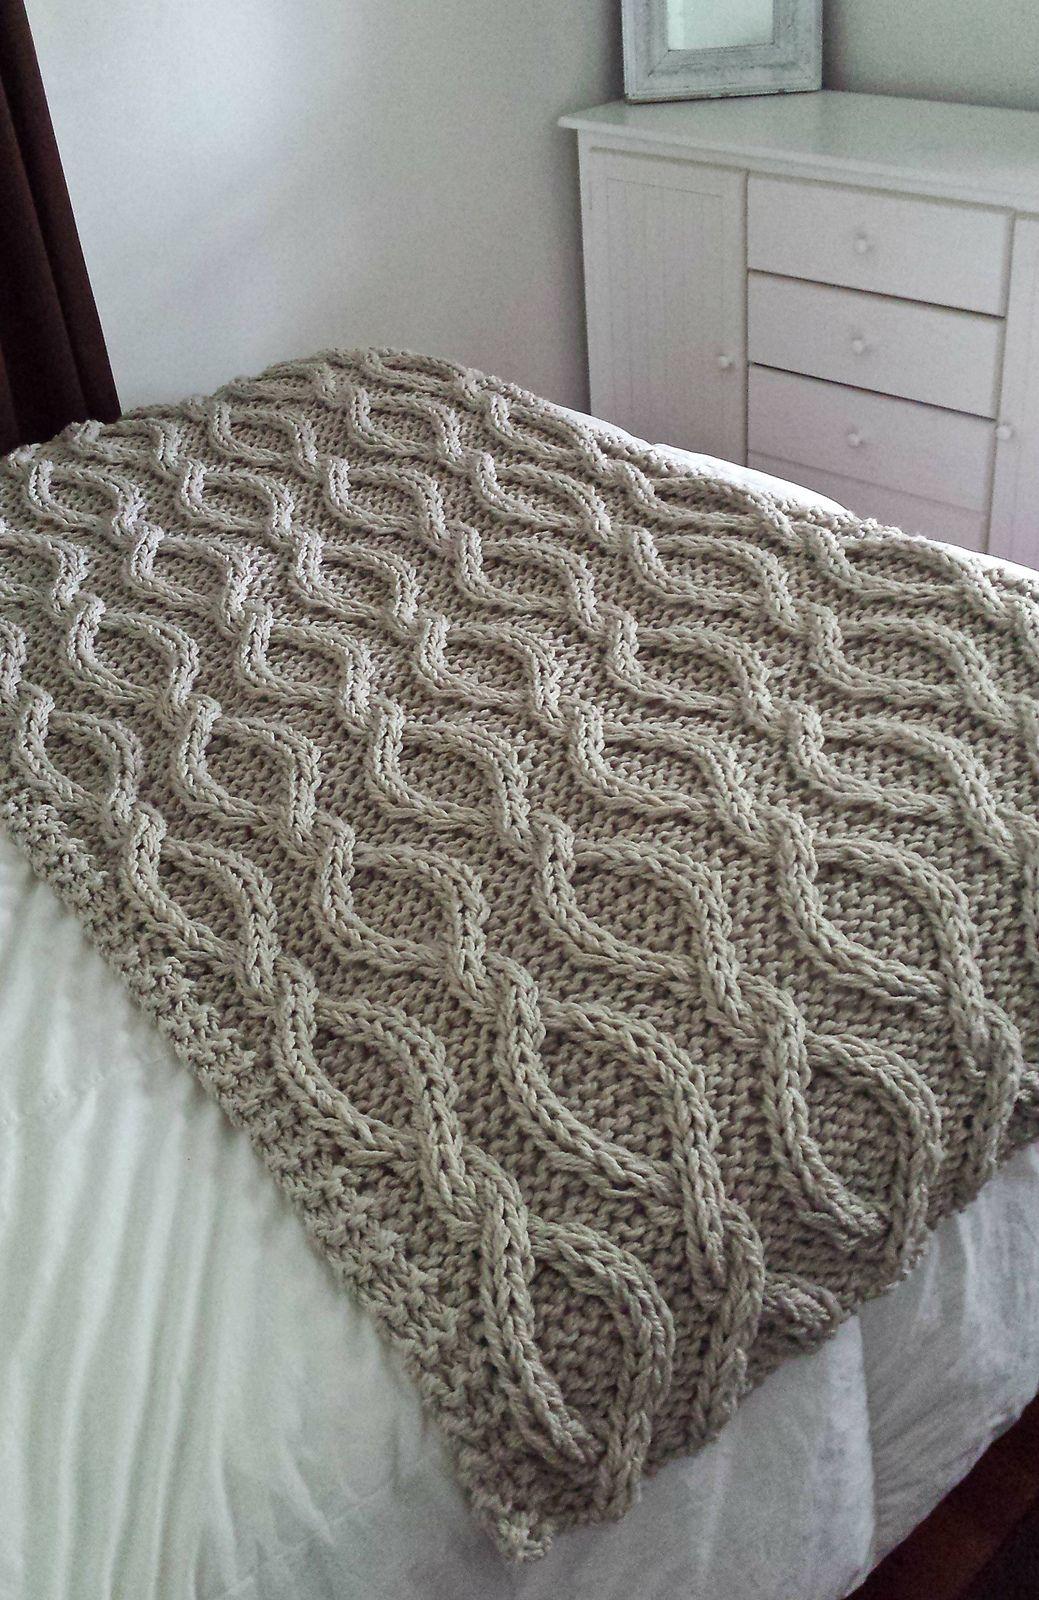 Infinity Cable Knit Blanket pattern by Allison Huddleston | Knitting ...